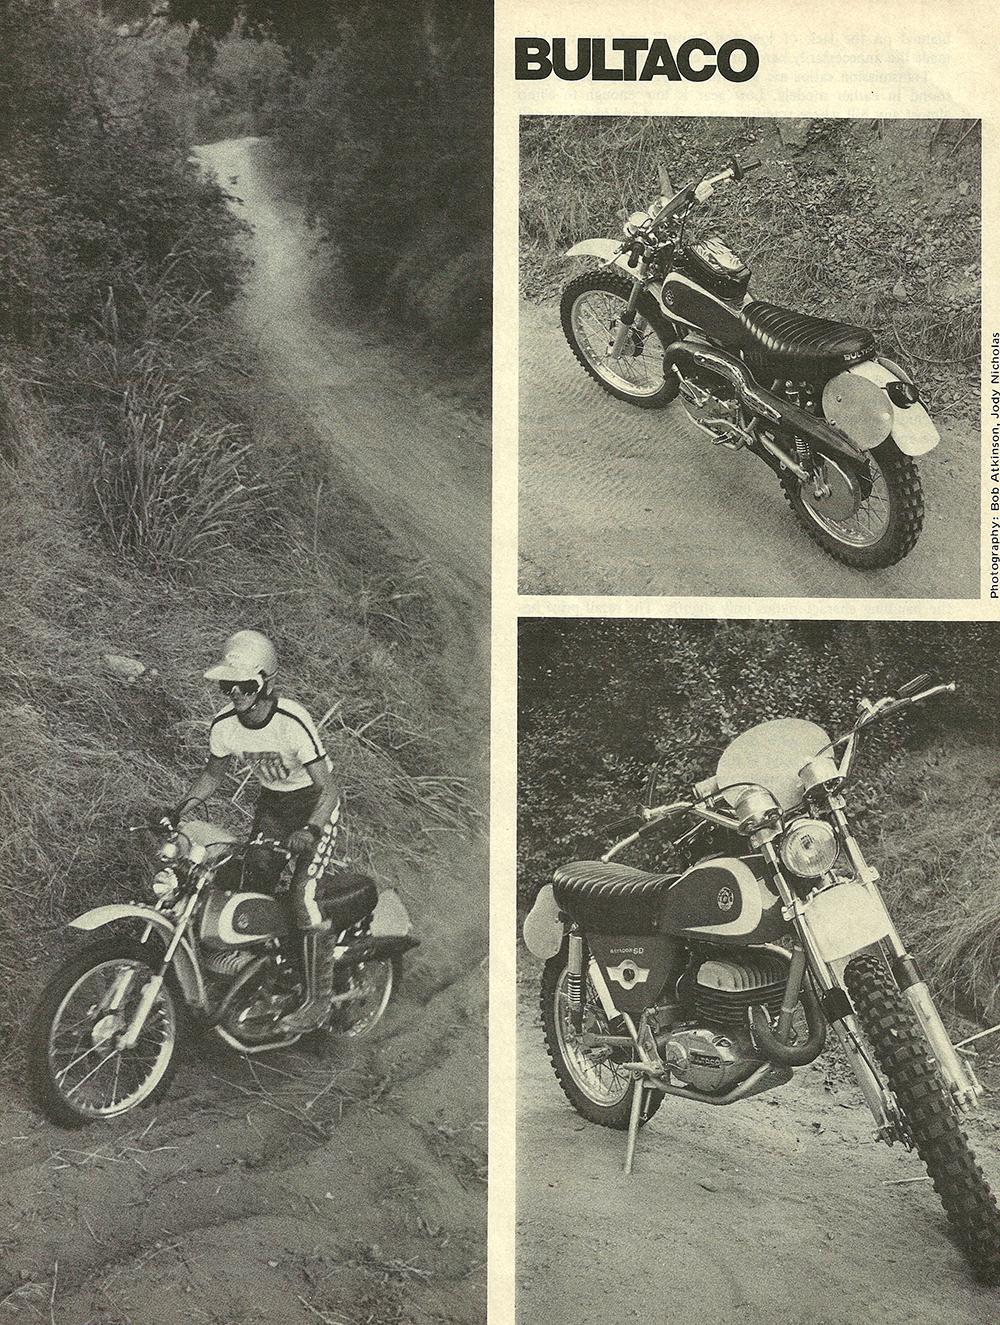 1974 Bultaco Matador 250 Mark 5 road test 04.jpg